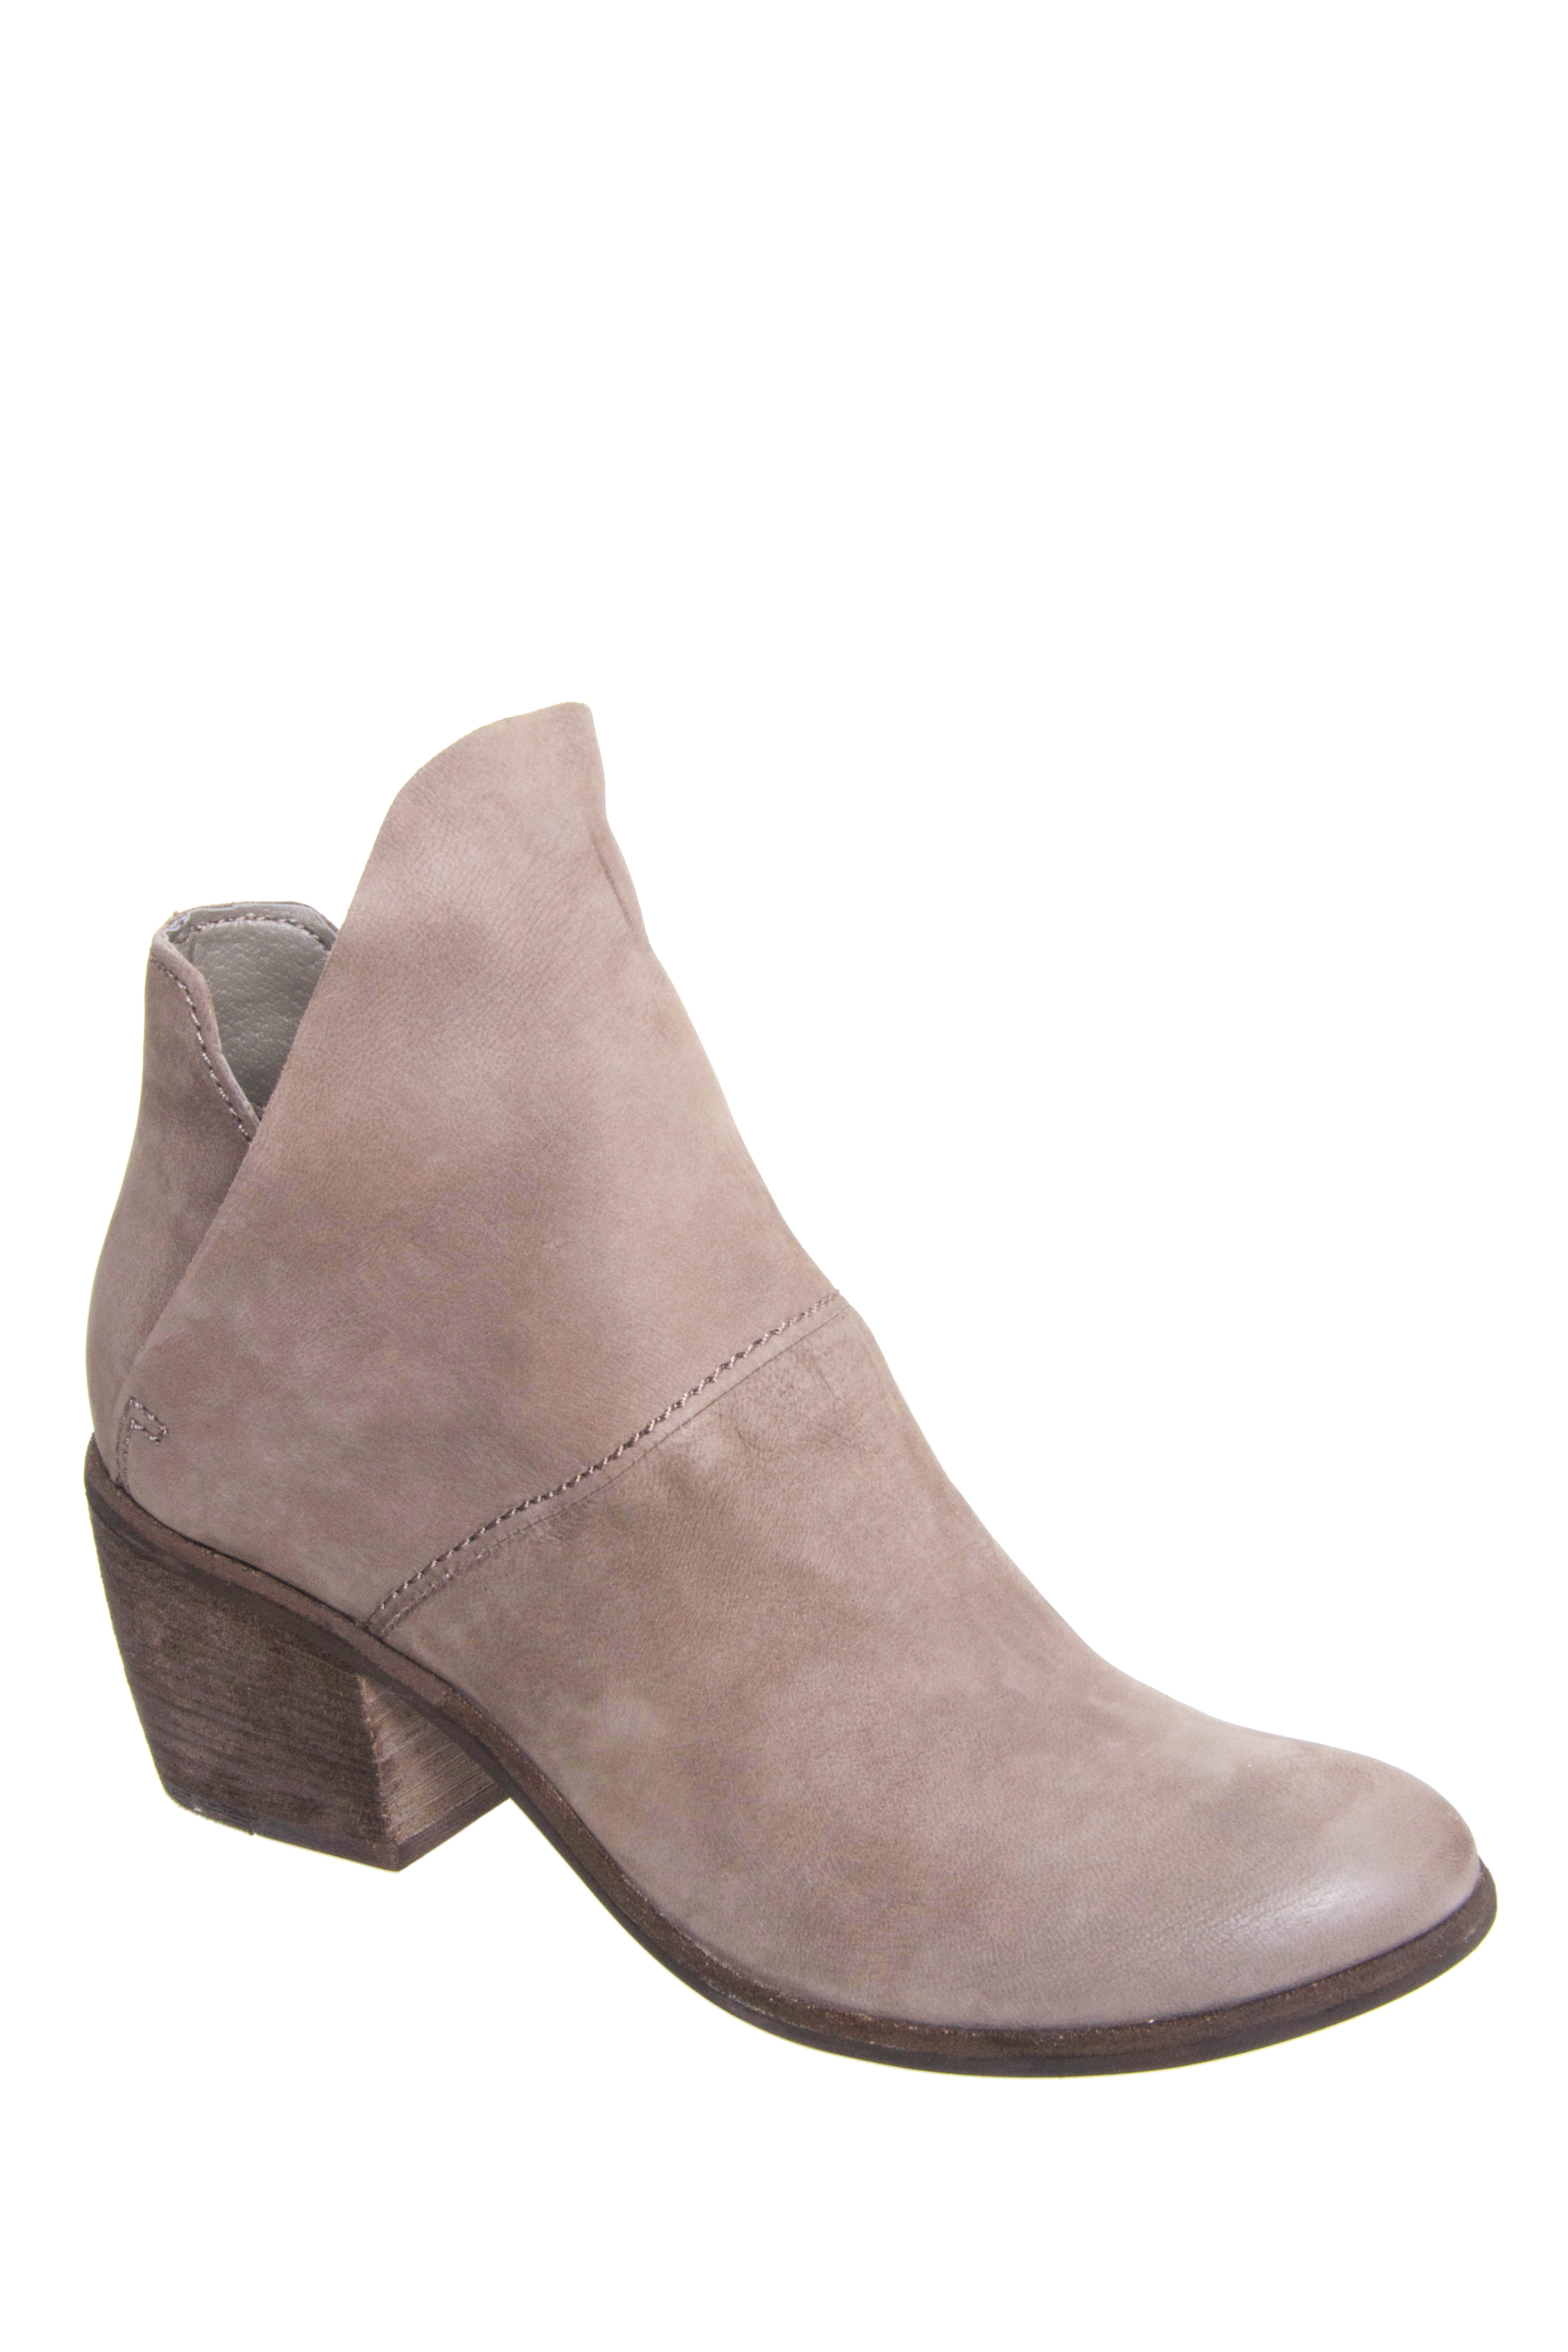 Dolce Vita Salena Mid Heel Booties - Grey Nubuck